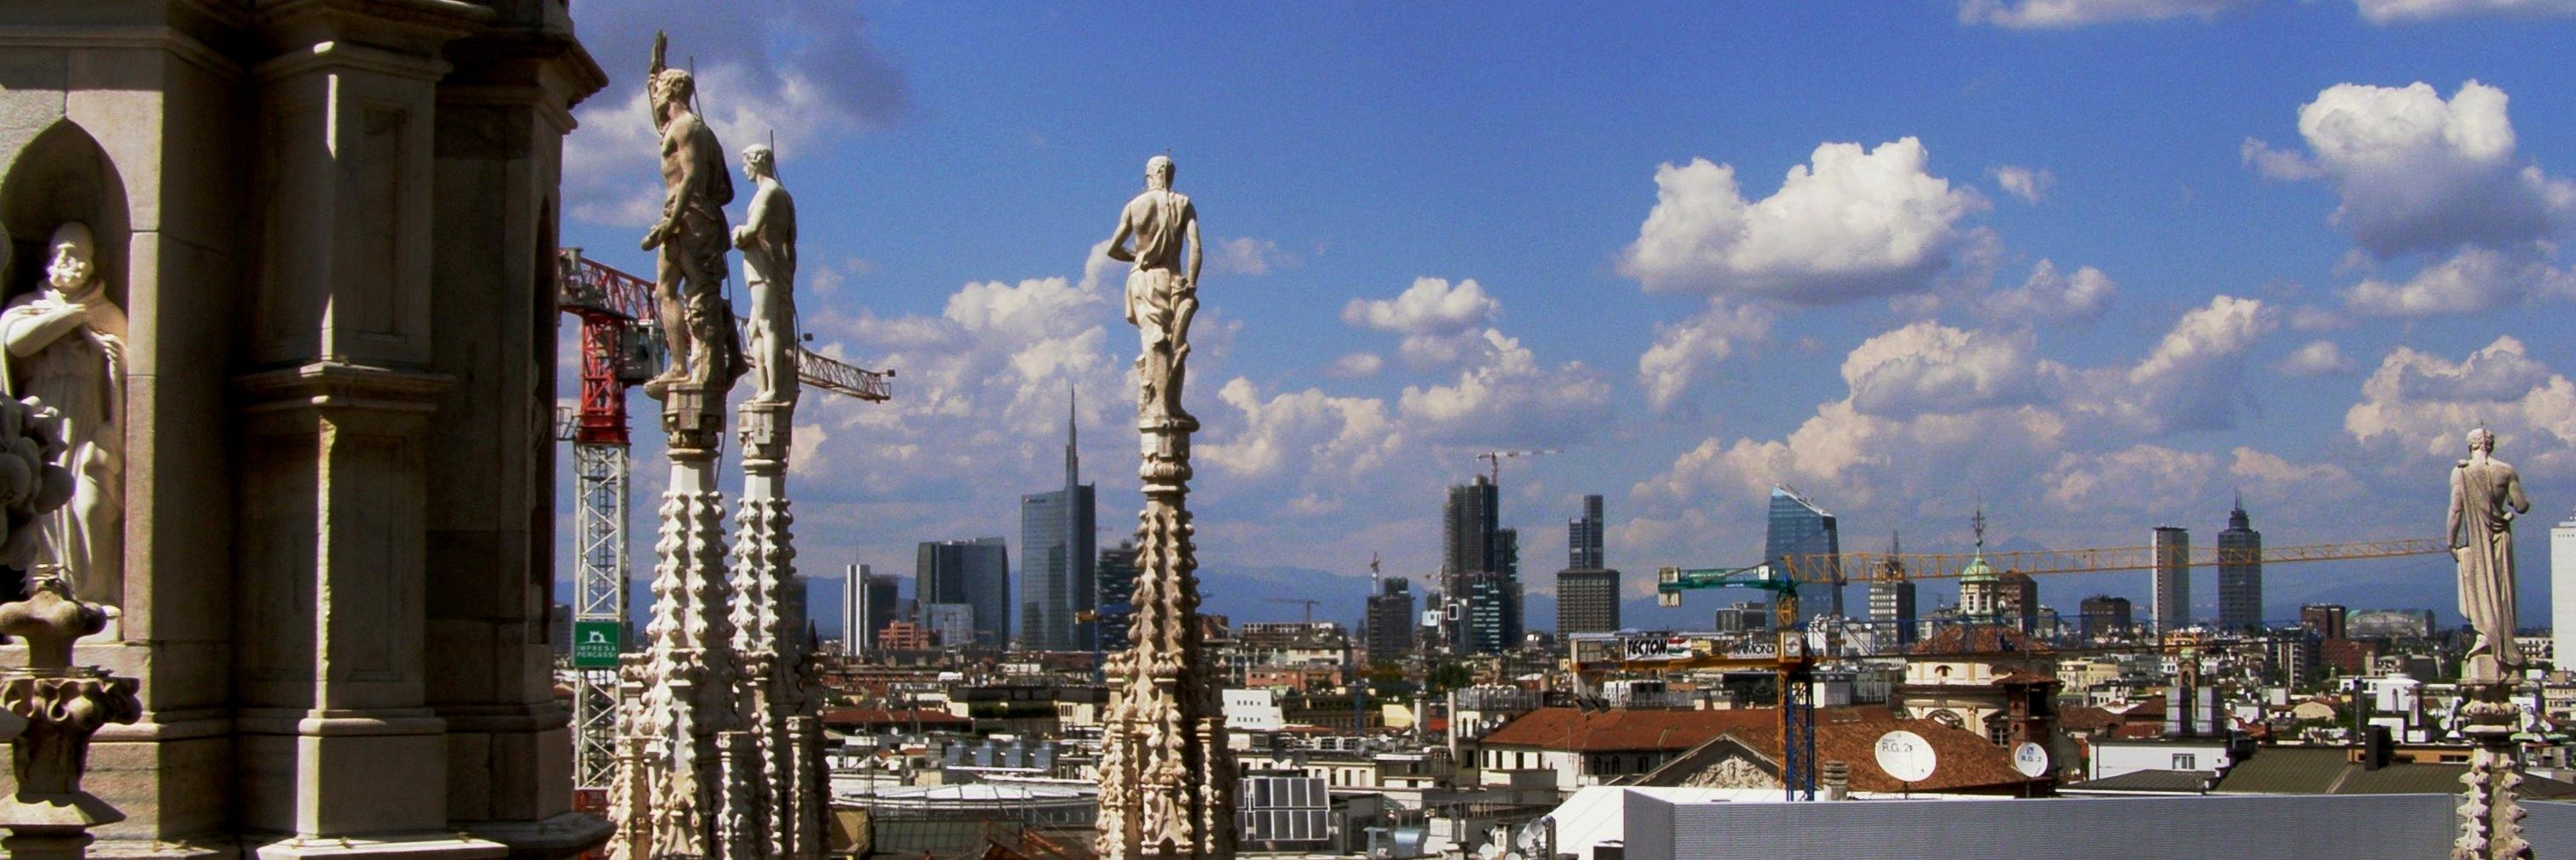 Milano_skyline-preti sas